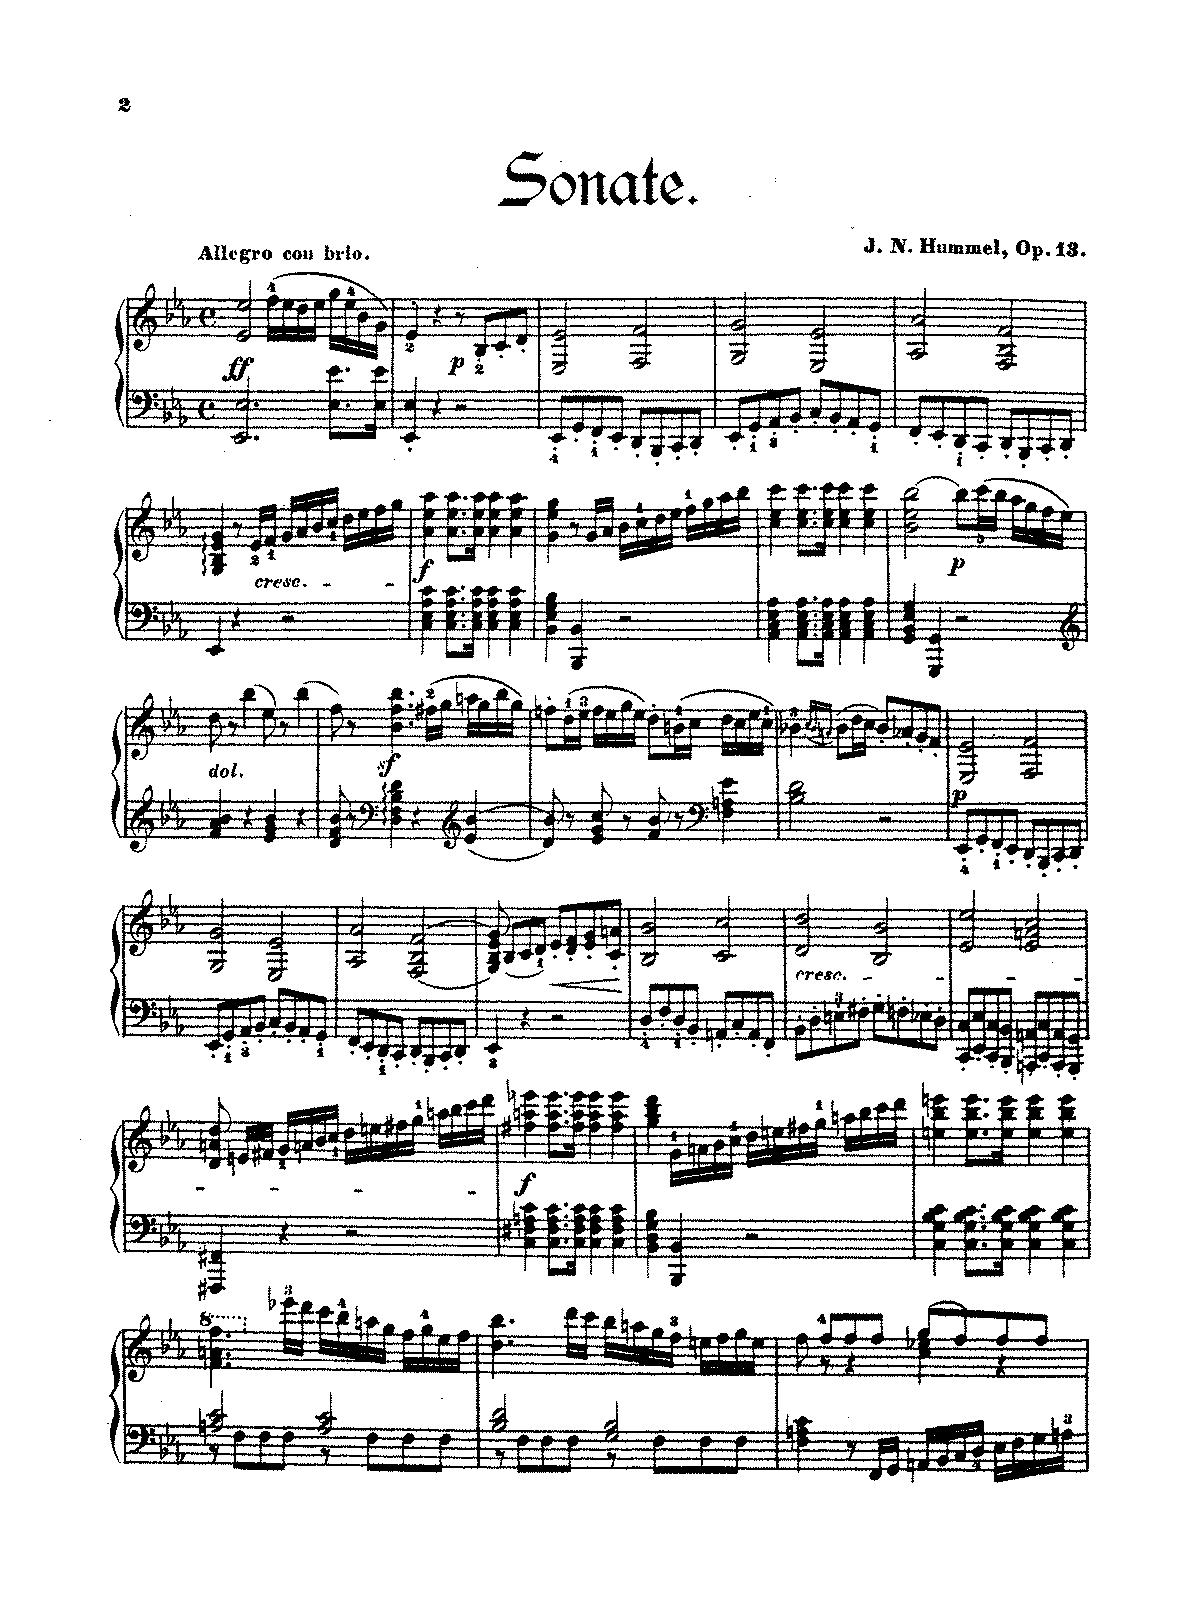 Hummel, Sonata Allelulja